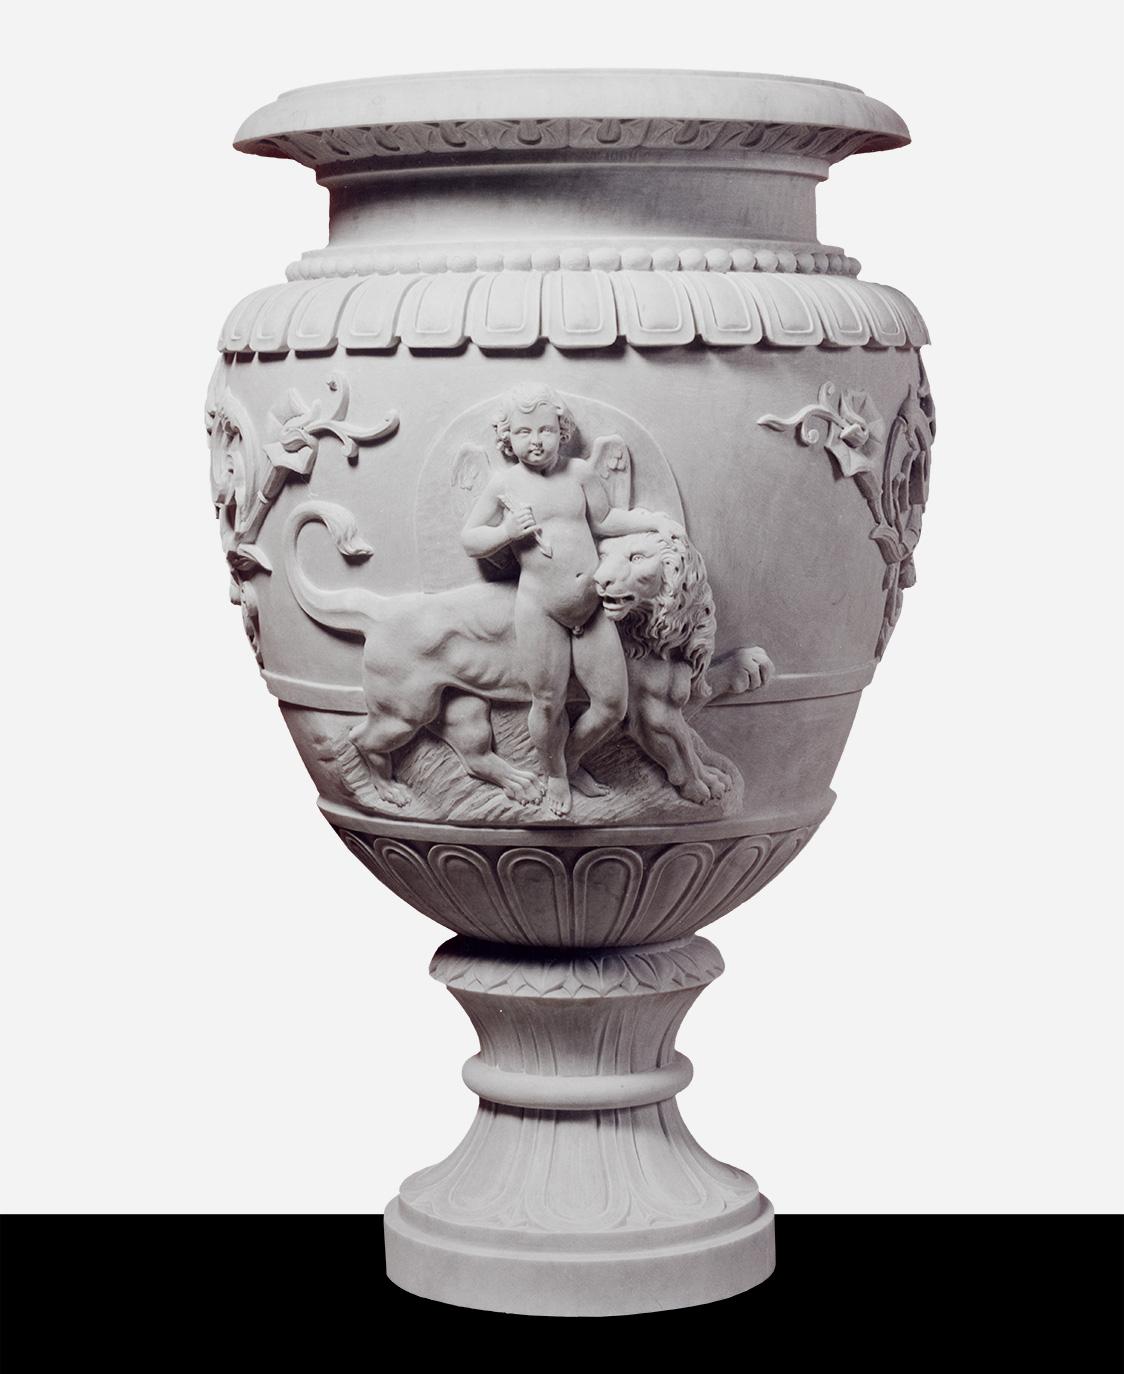 Vasi in marmo logic art galeotti pietrasanta for Vasi marmo